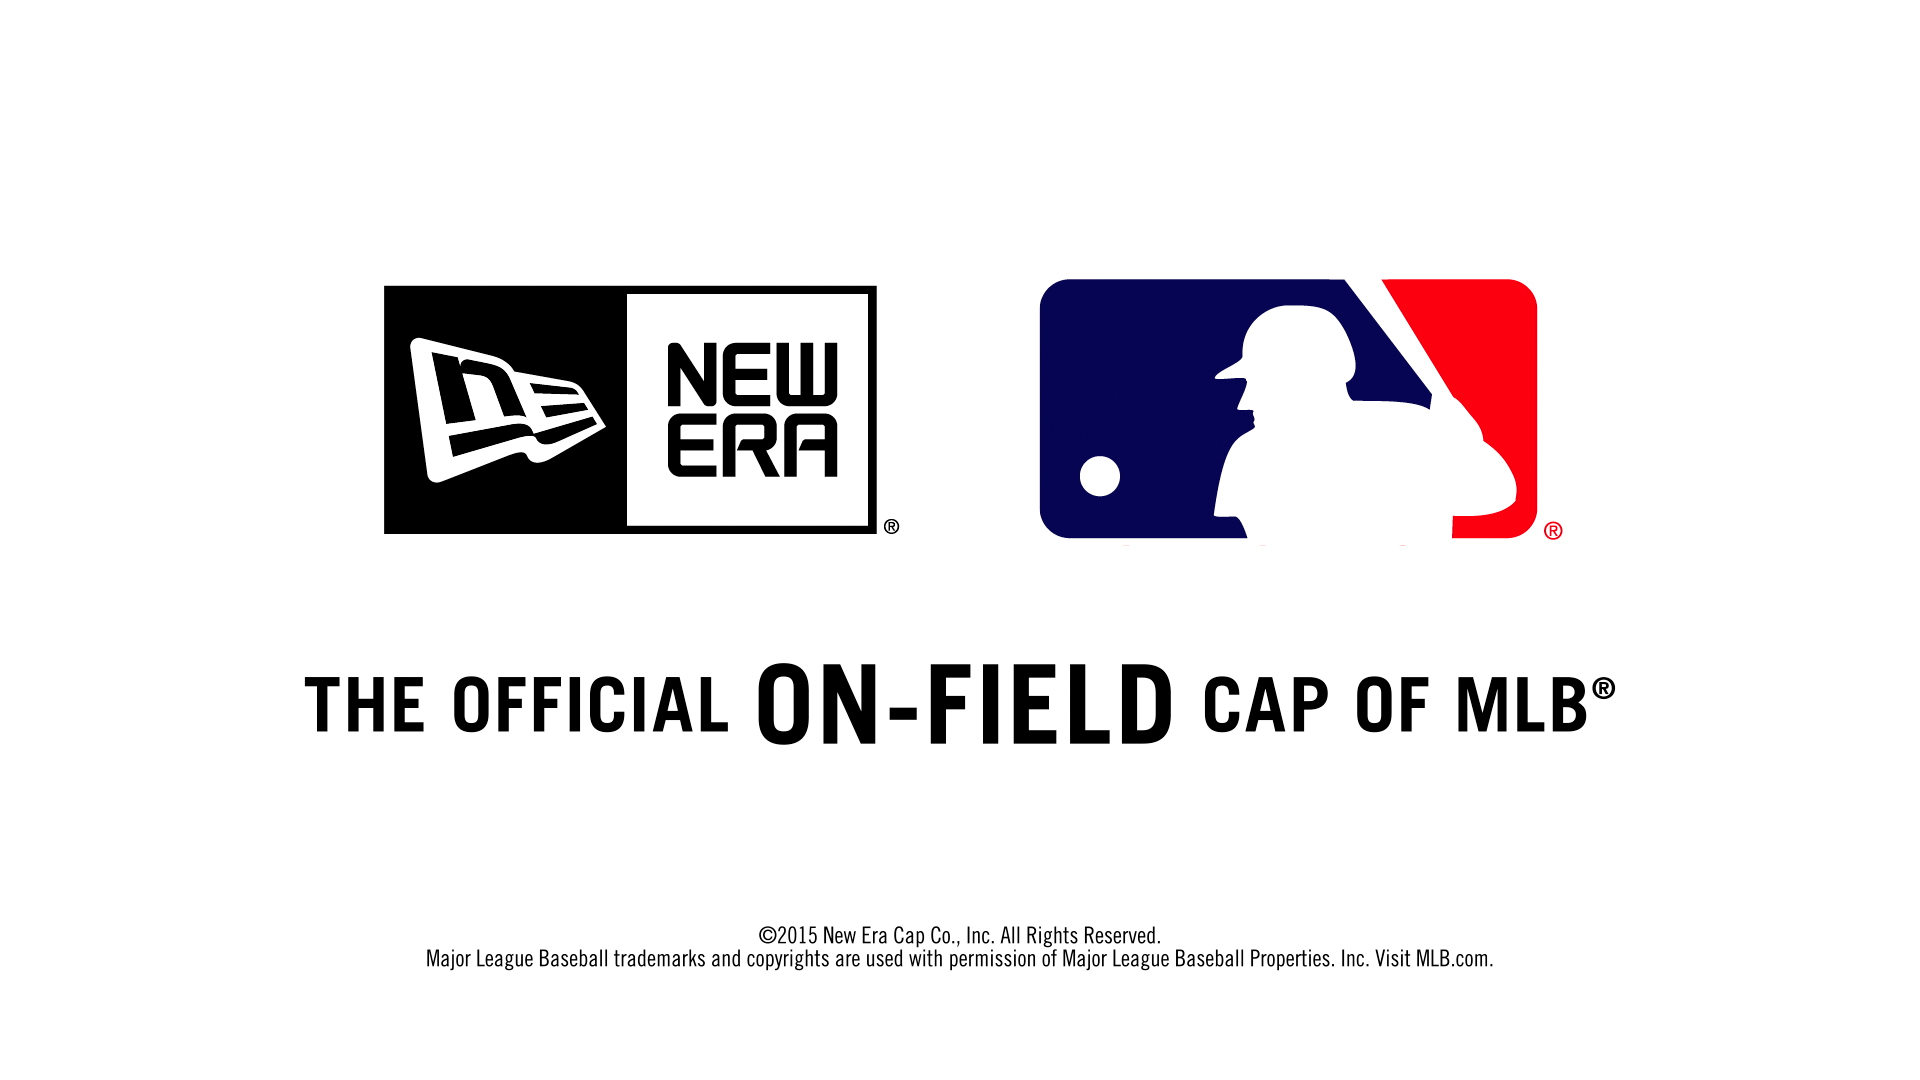 TITC_MLB_10.jpg